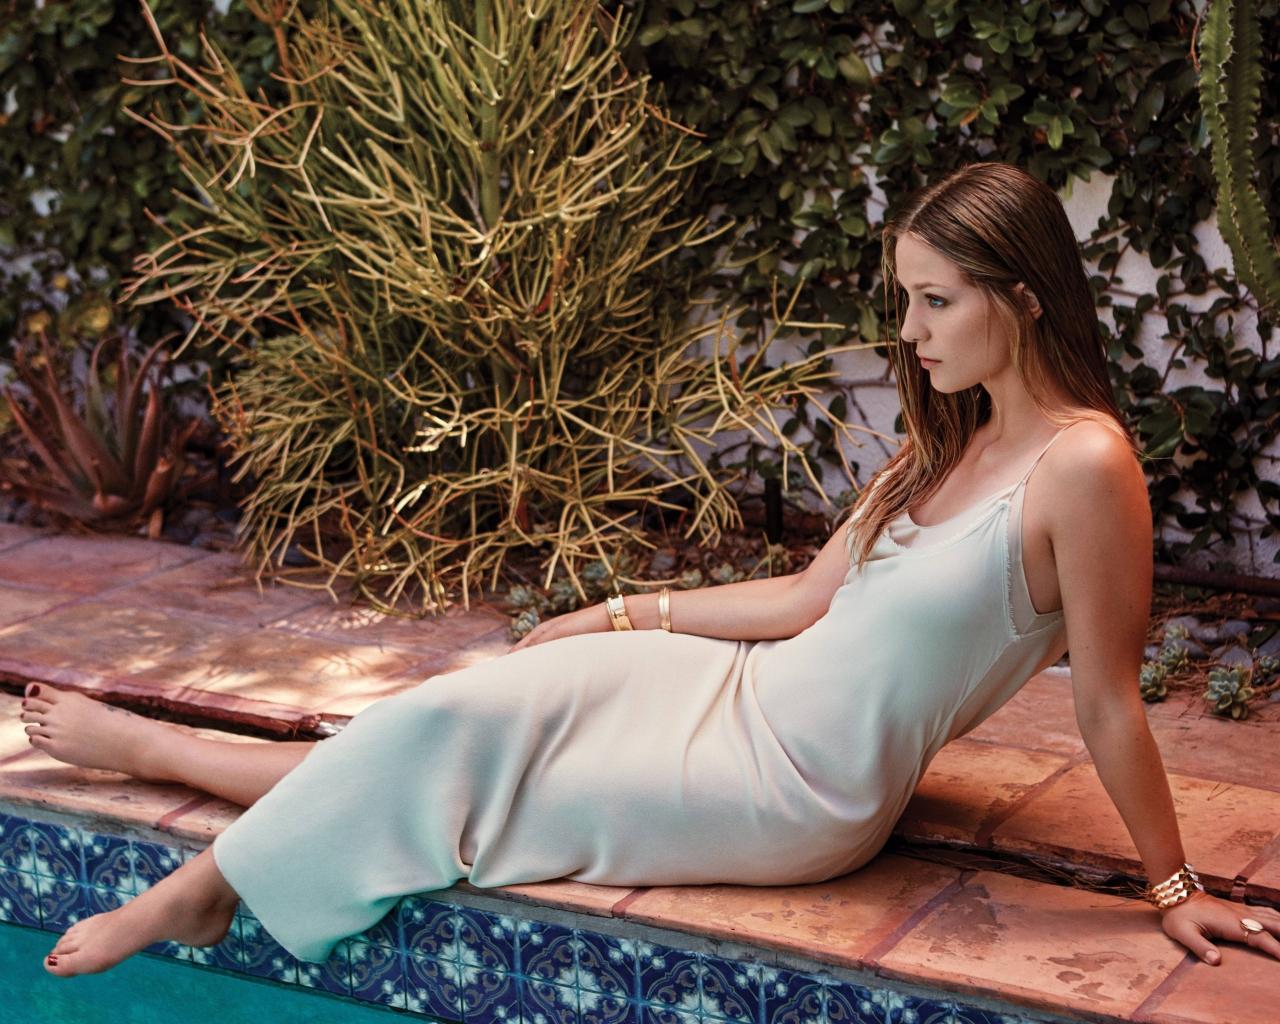 Melissa Gorga 4k Wallpapers: Melissa Benoist Hot 2017, HD 4K Wallpaper